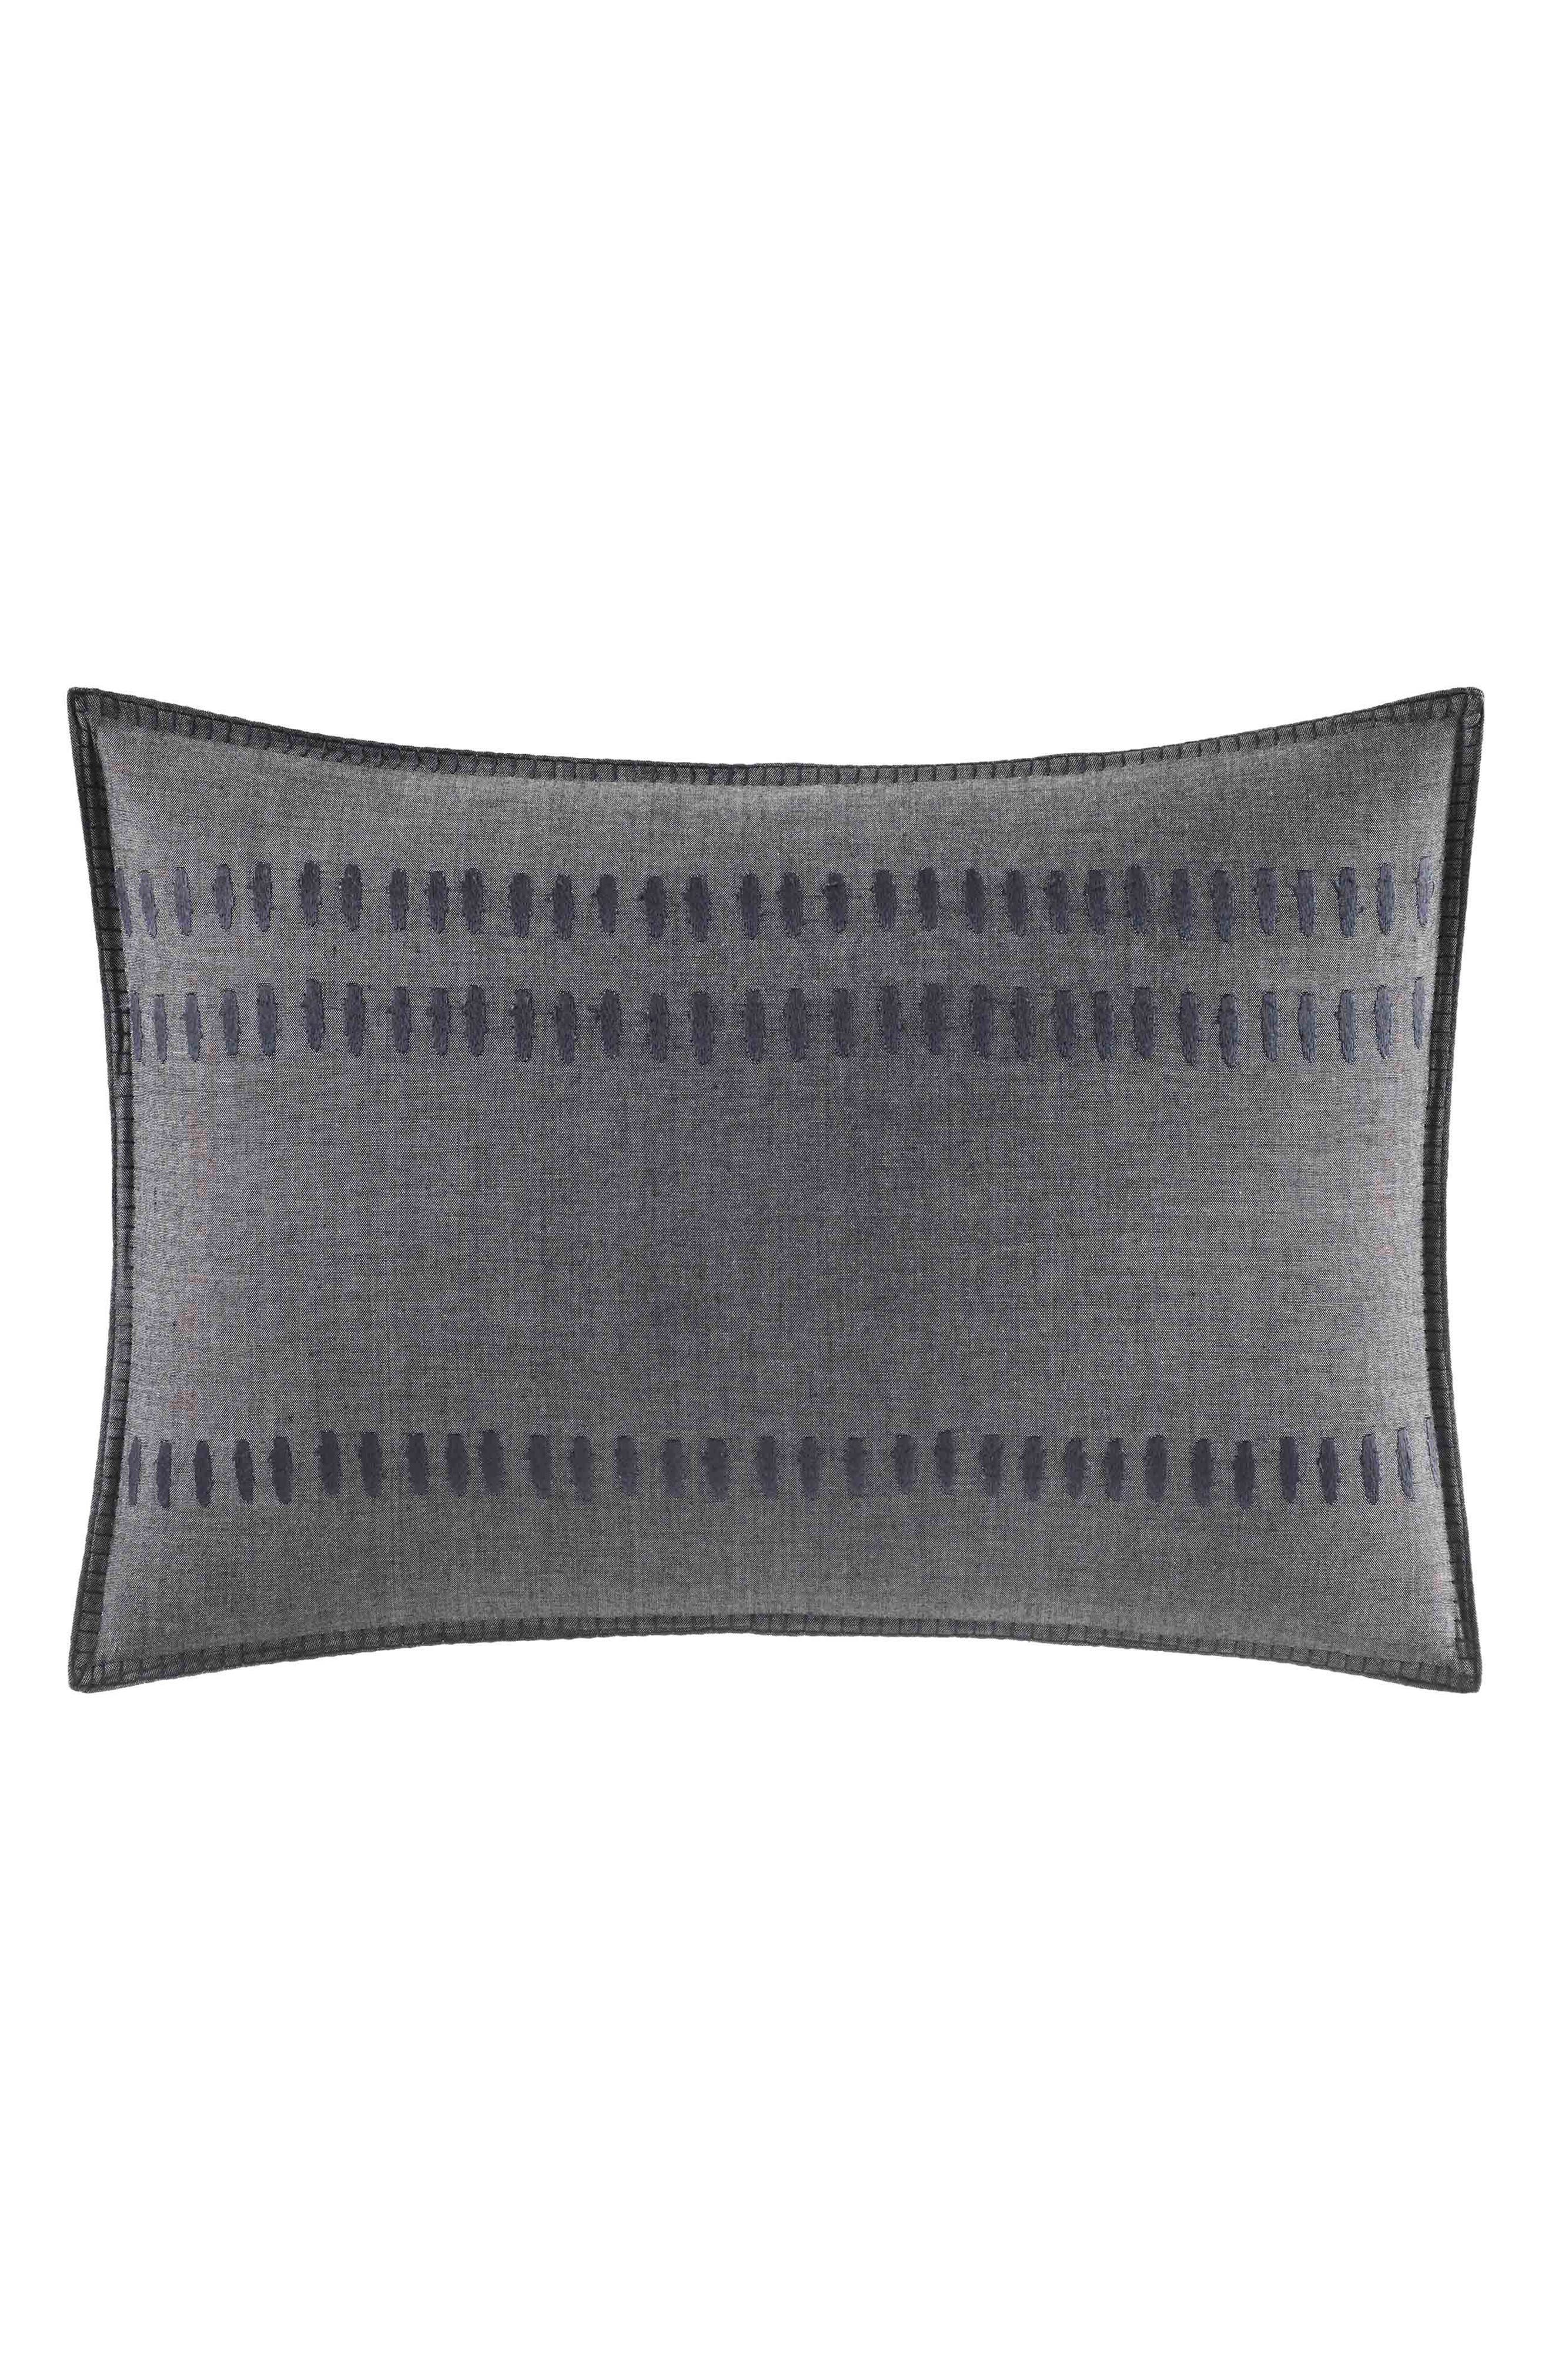 ED ELLEN DEGENERES, Nomad Stitched Accent Pillow, Main thumbnail 1, color, DARK GREY